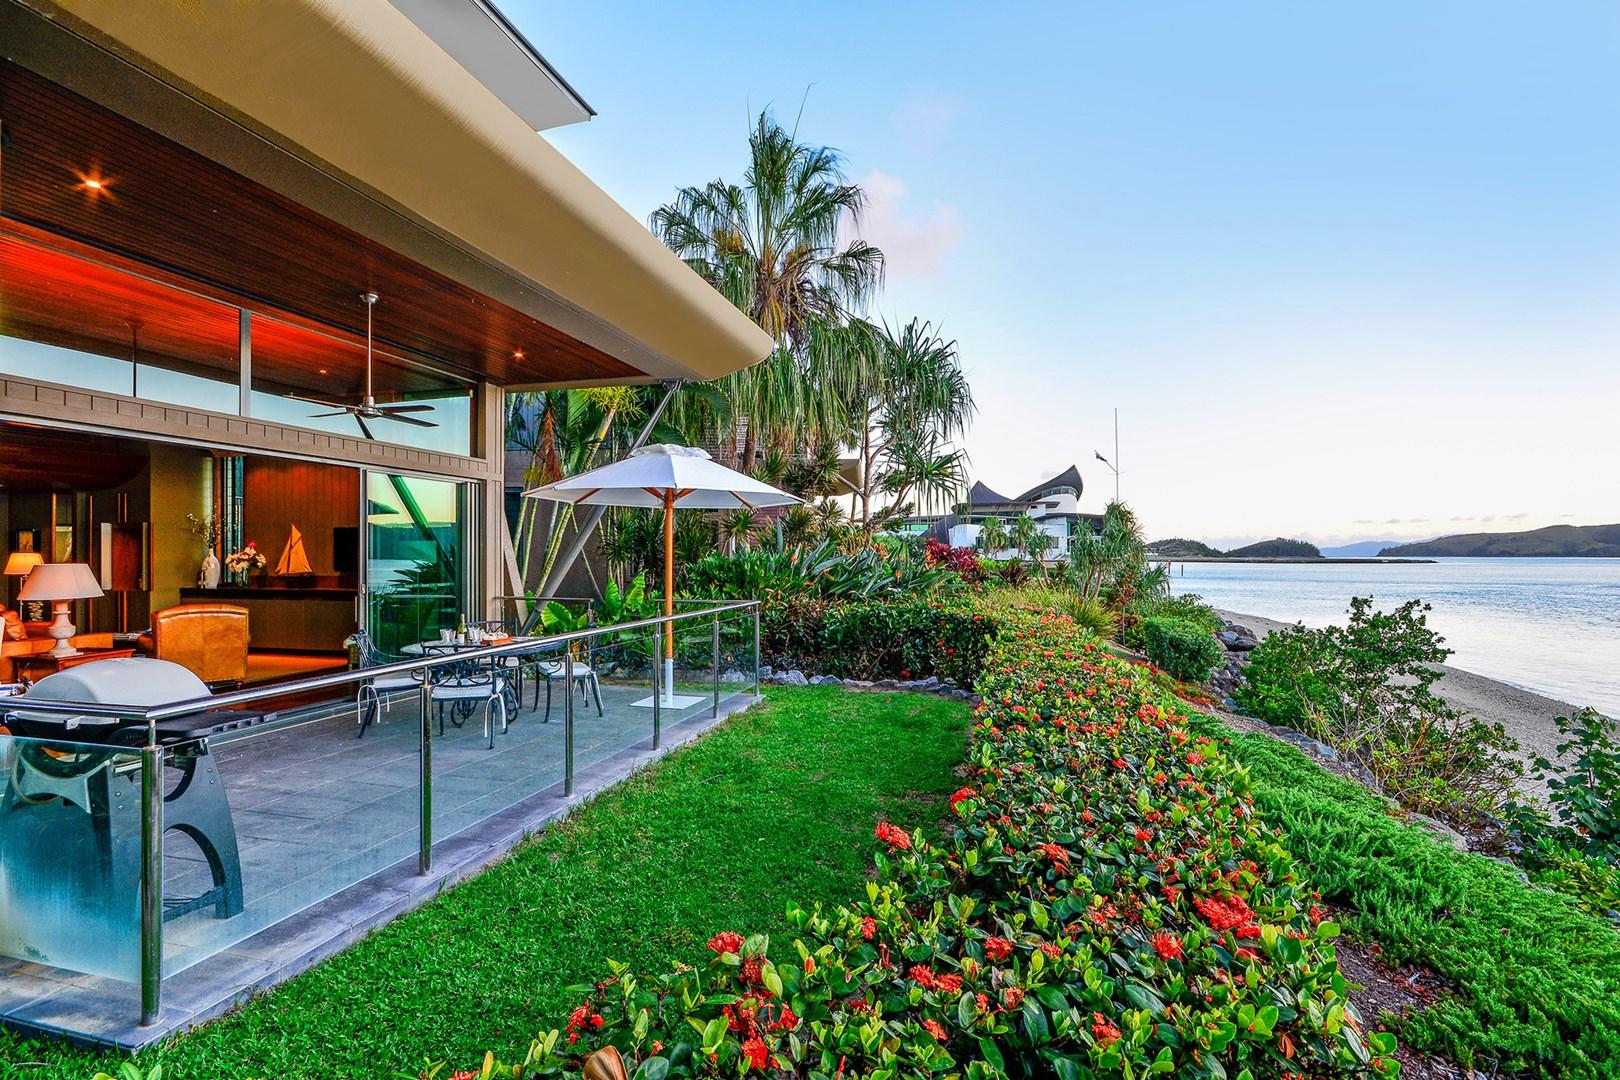 yacht club villa 11 4 front street hamilton island qld. Black Bedroom Furniture Sets. Home Design Ideas